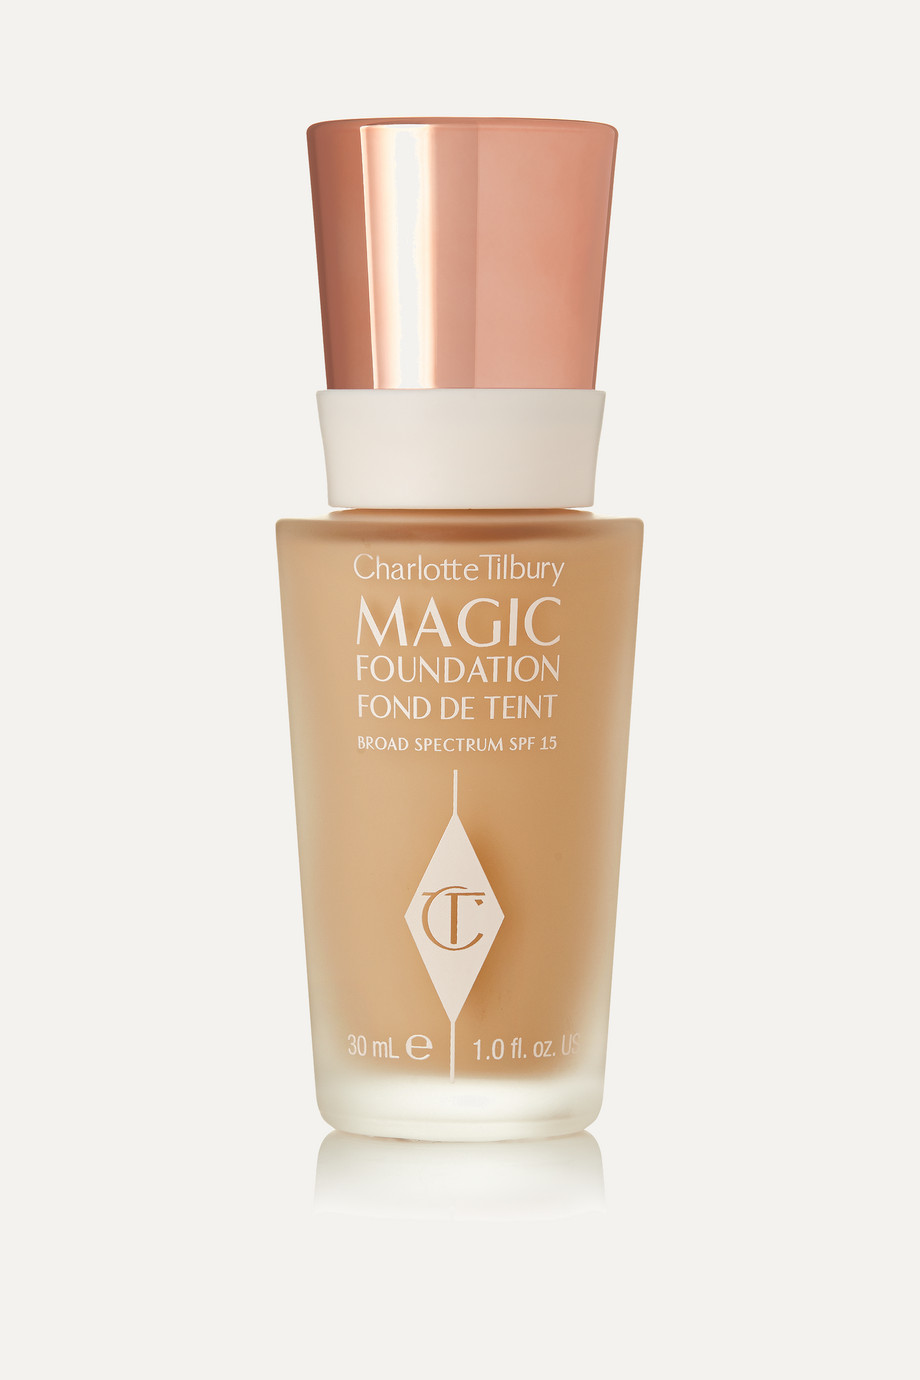 Charlotte Tilbury Magic Foundation Flawless Long-Lasting Coverage LSF 15 – Shade 4, 30 ml – Foundation